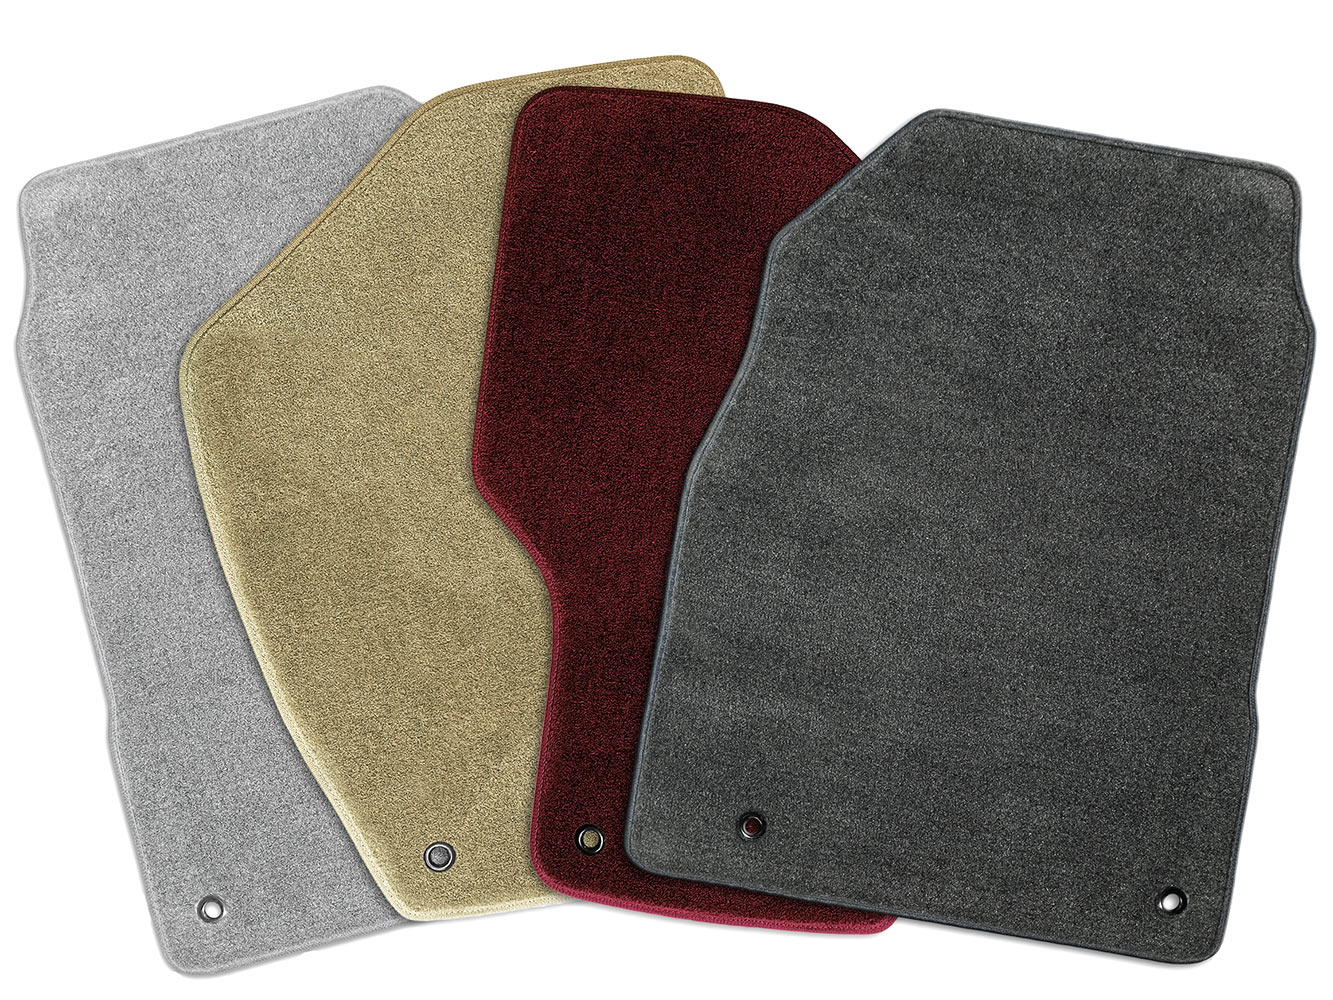 Floor mats mazda 3 - Dash Designs Endura Floor Mats